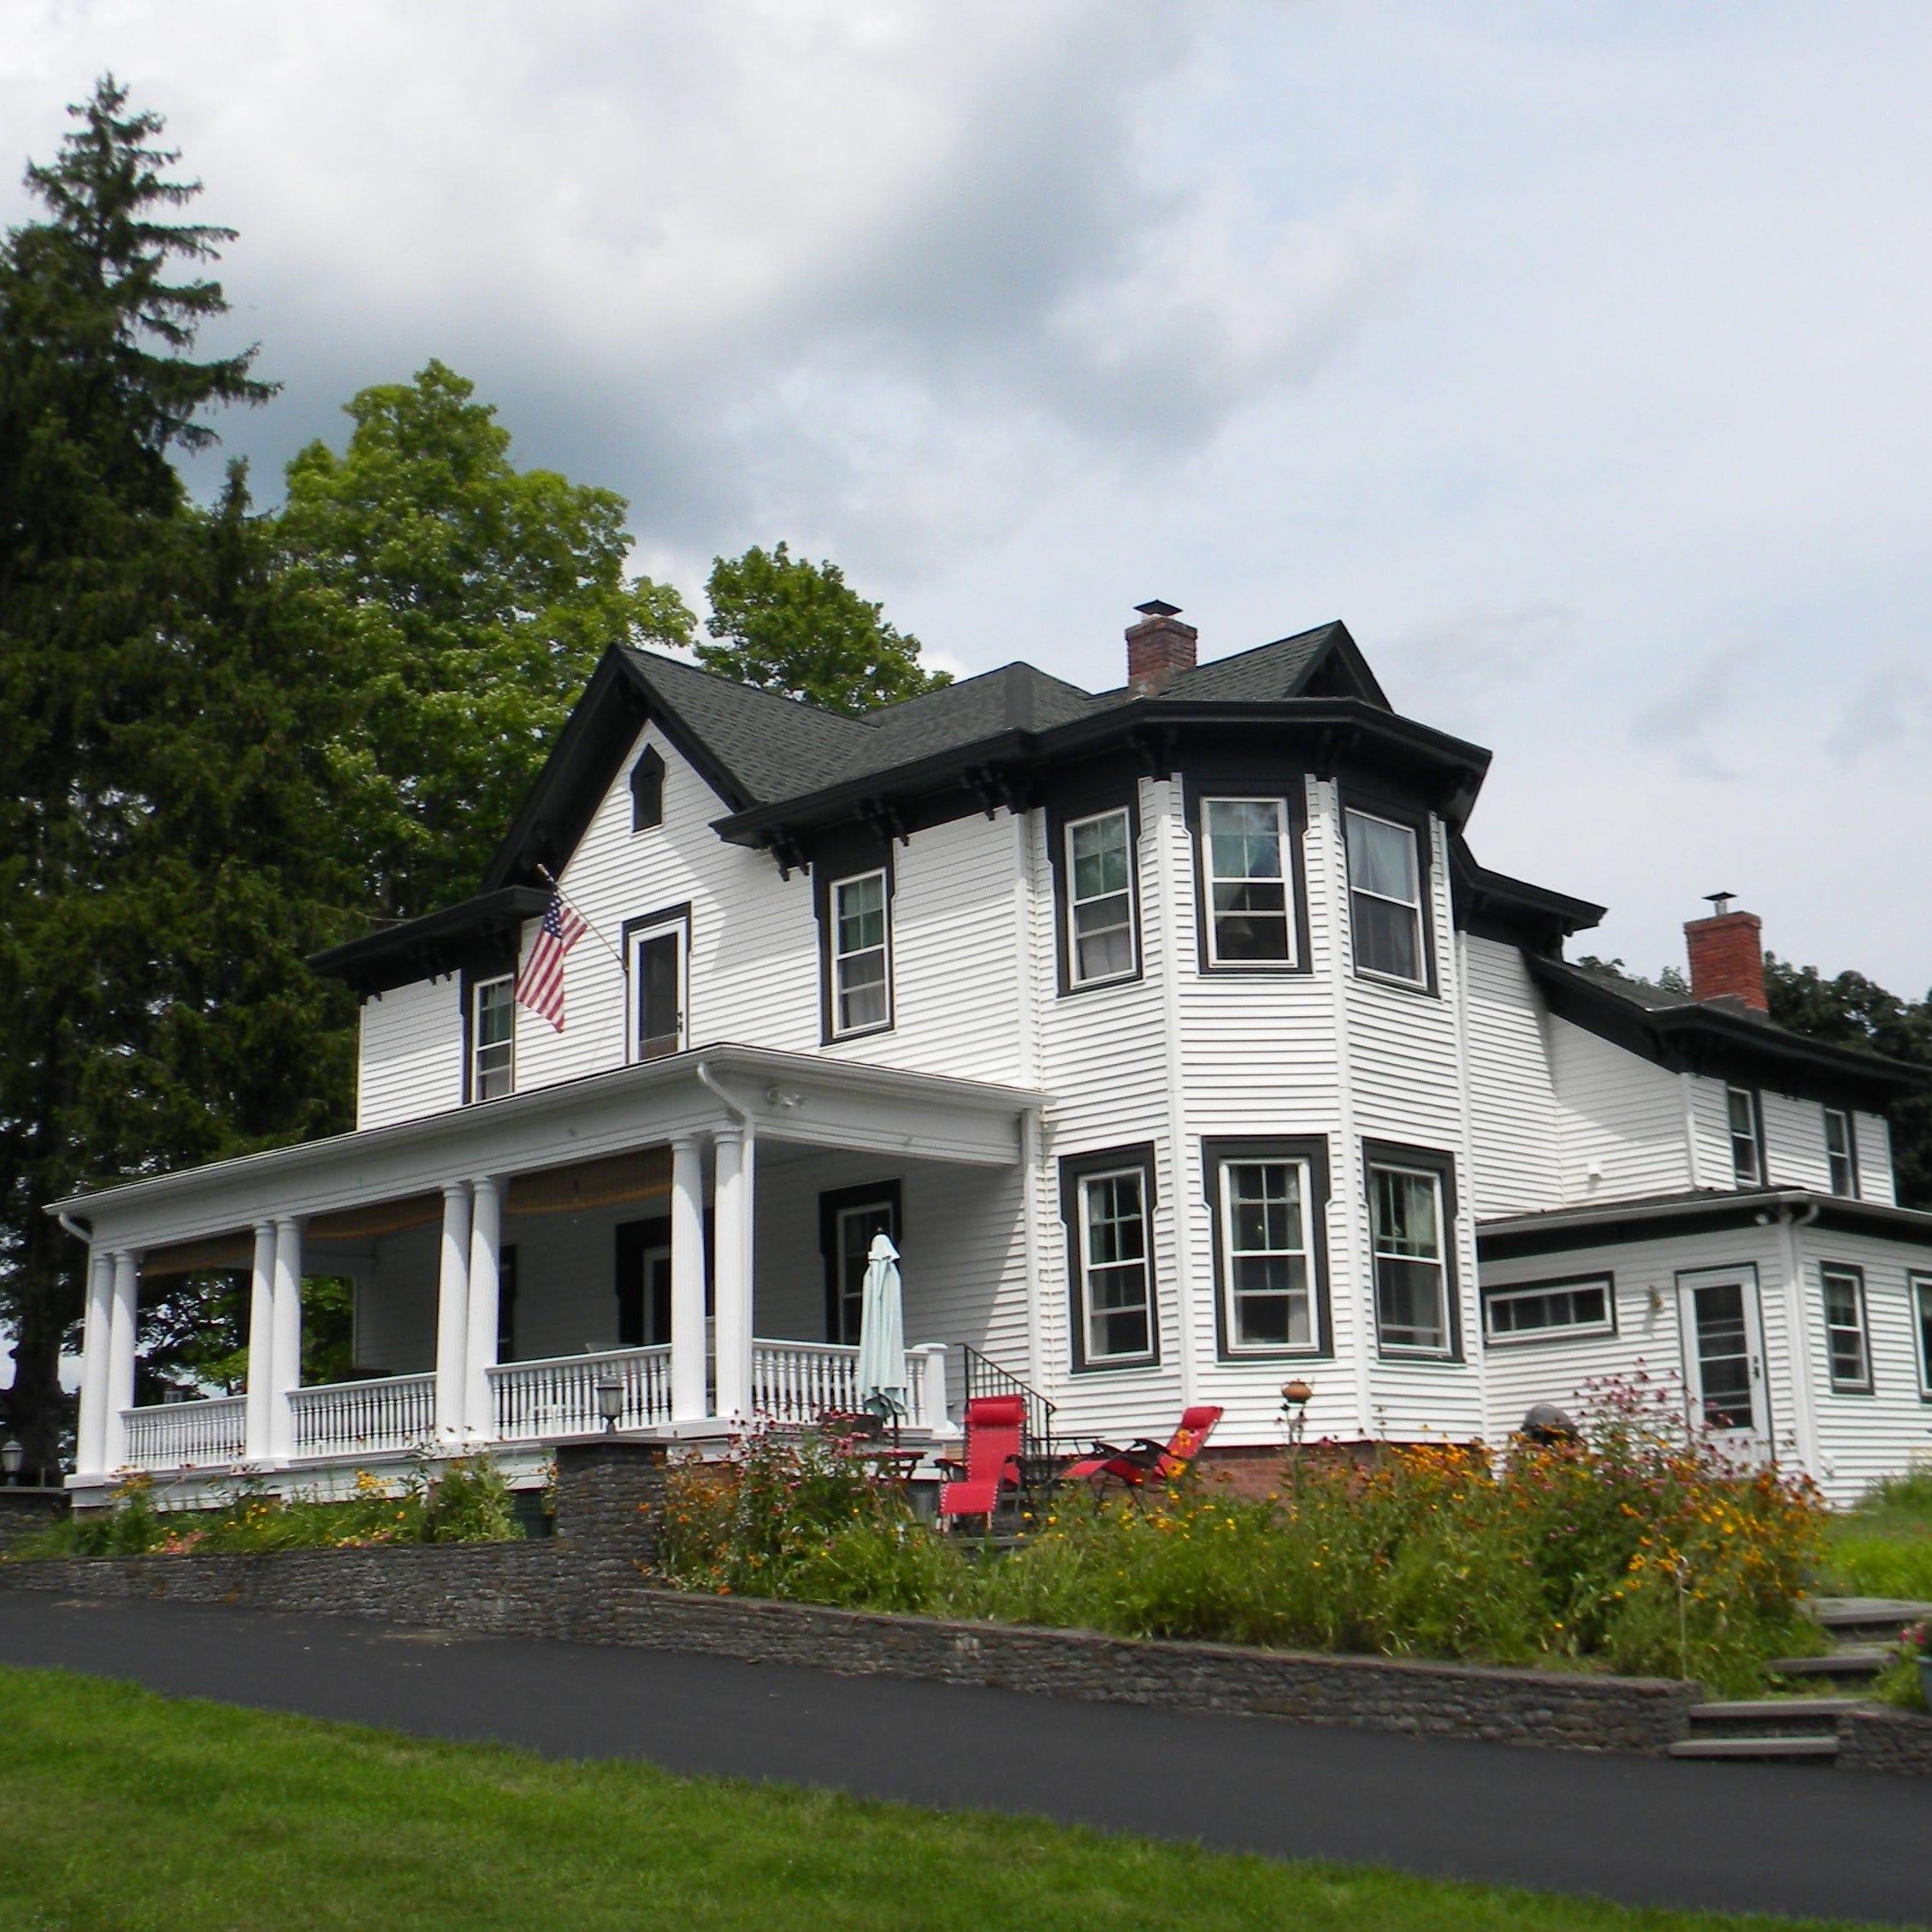 Staatsburg's Harper House likely built by Livingstons for housekeeper